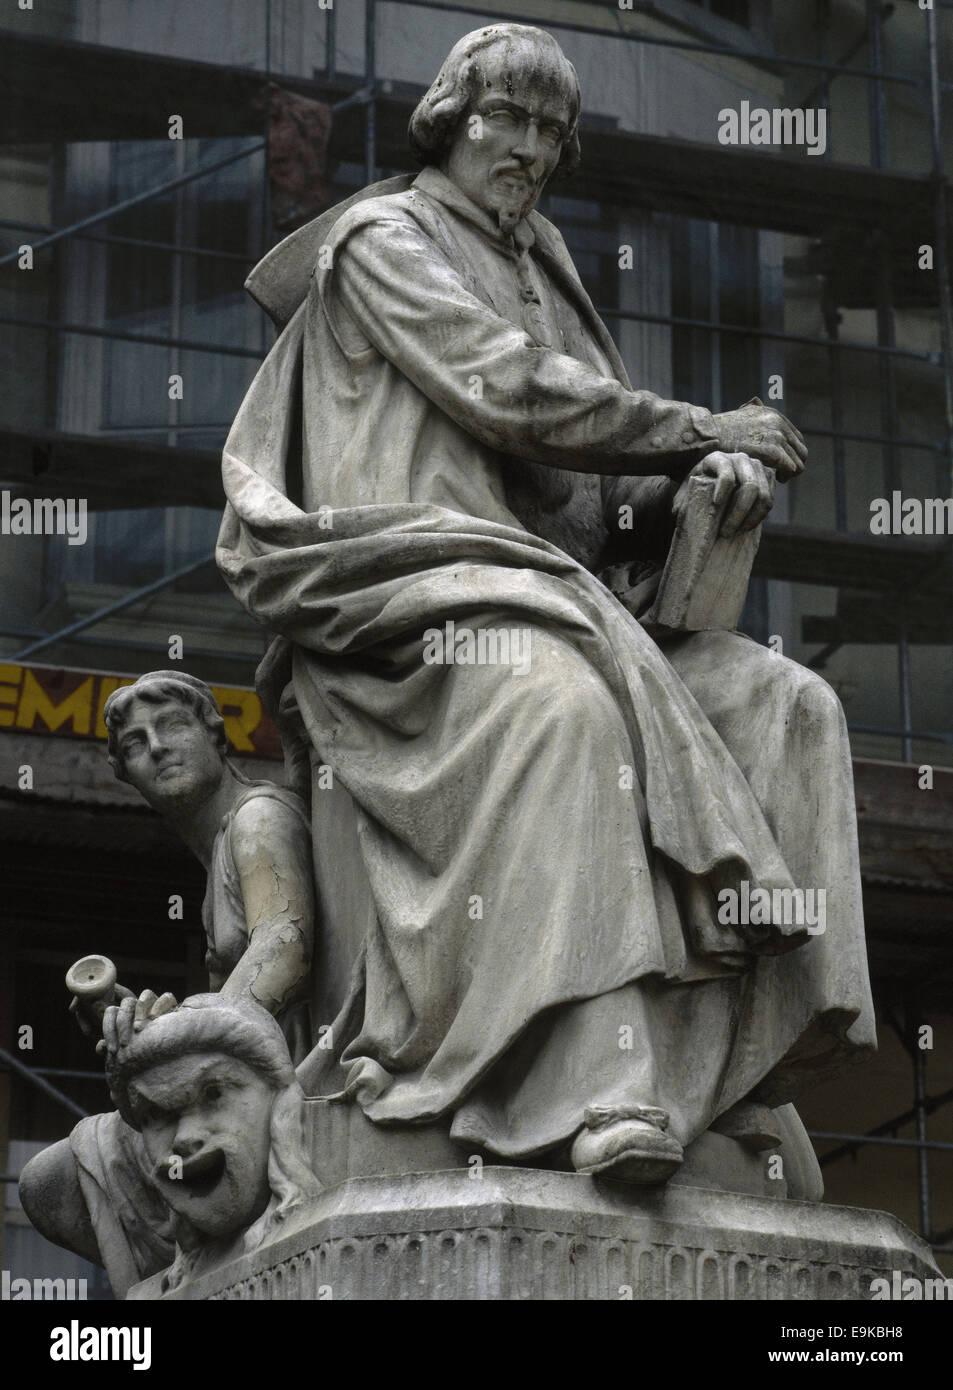 Calderon de la Barca (1600-1681). Spanish writer. Golden Age. Statue by Juan Figueras Vila (1829-1881) in 1876. - Stock Image